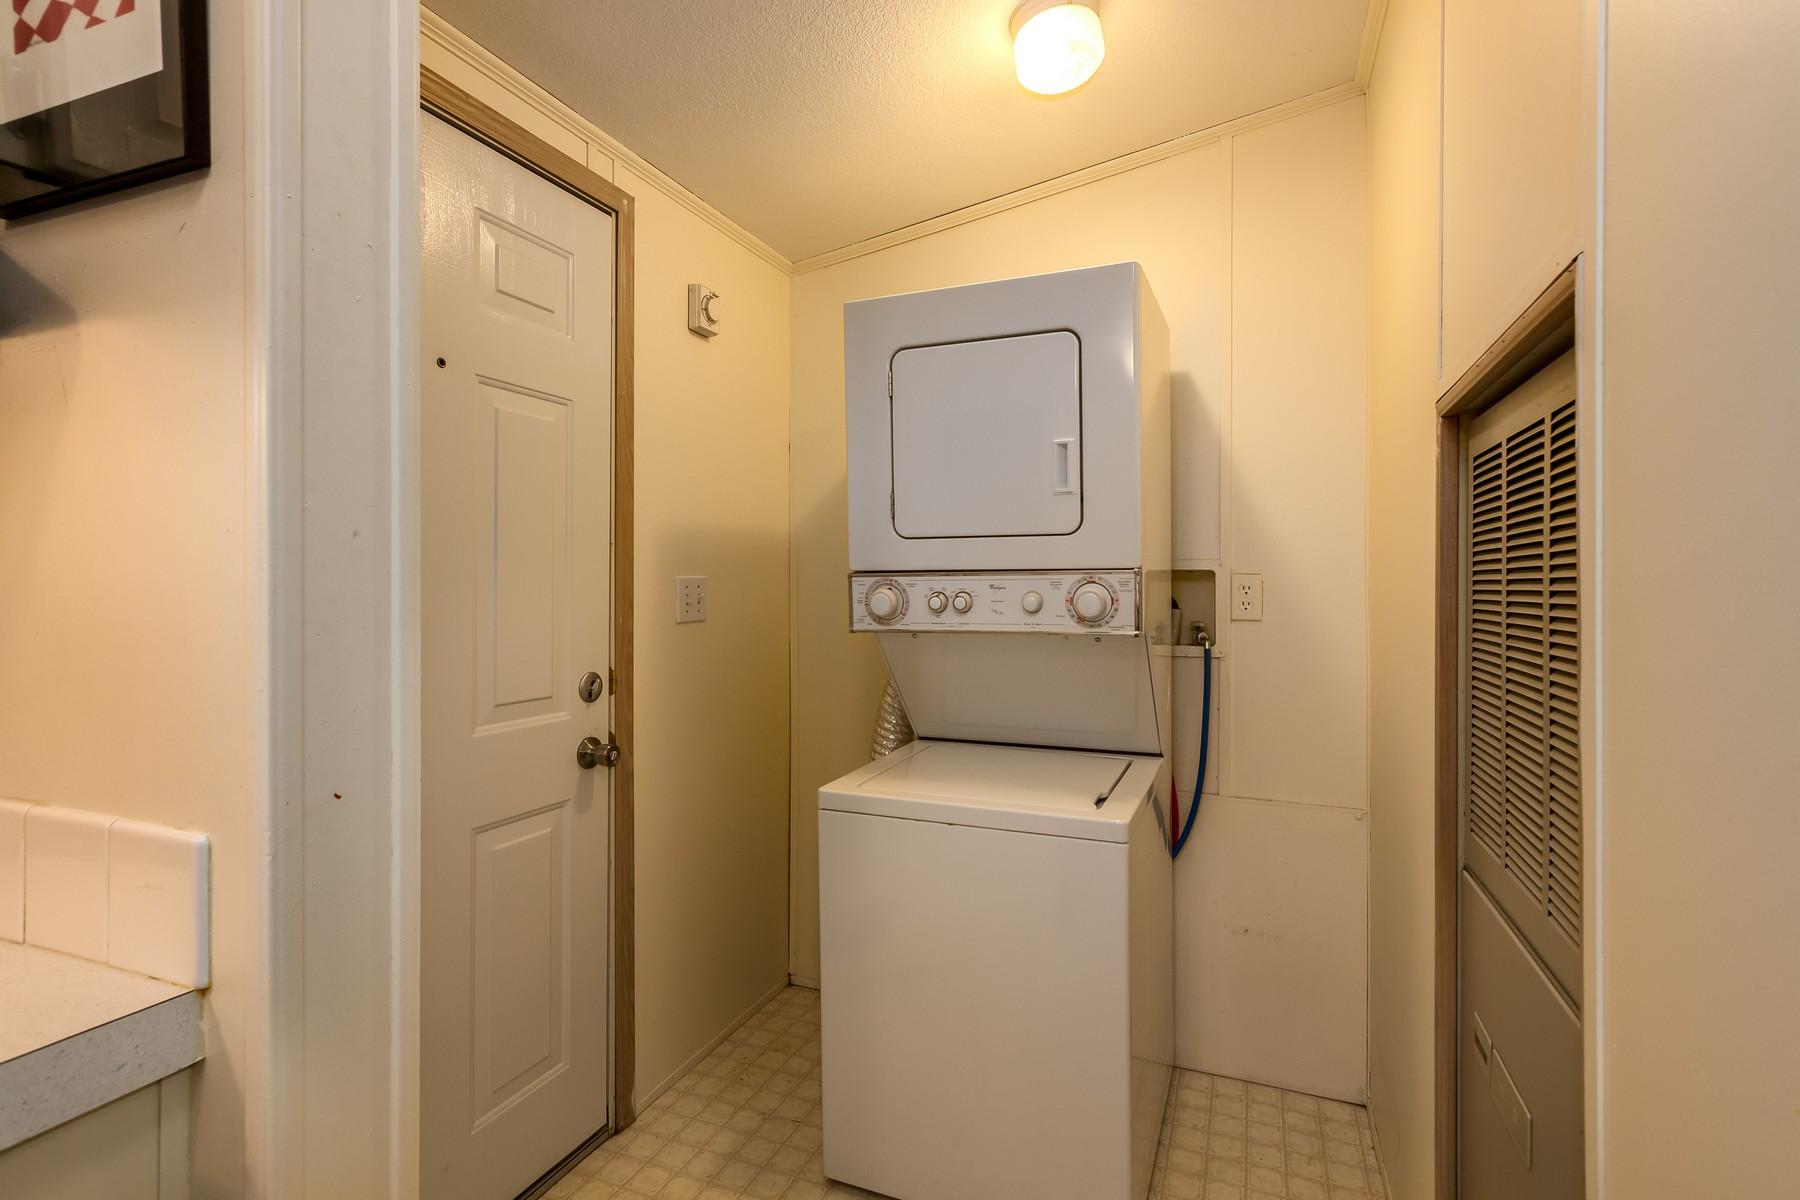 Additional photo for property listing at Affordable Gem in Fletcher Bay 8480 NE Hansen Rd Bainbridge Island, Washington 98110 United States